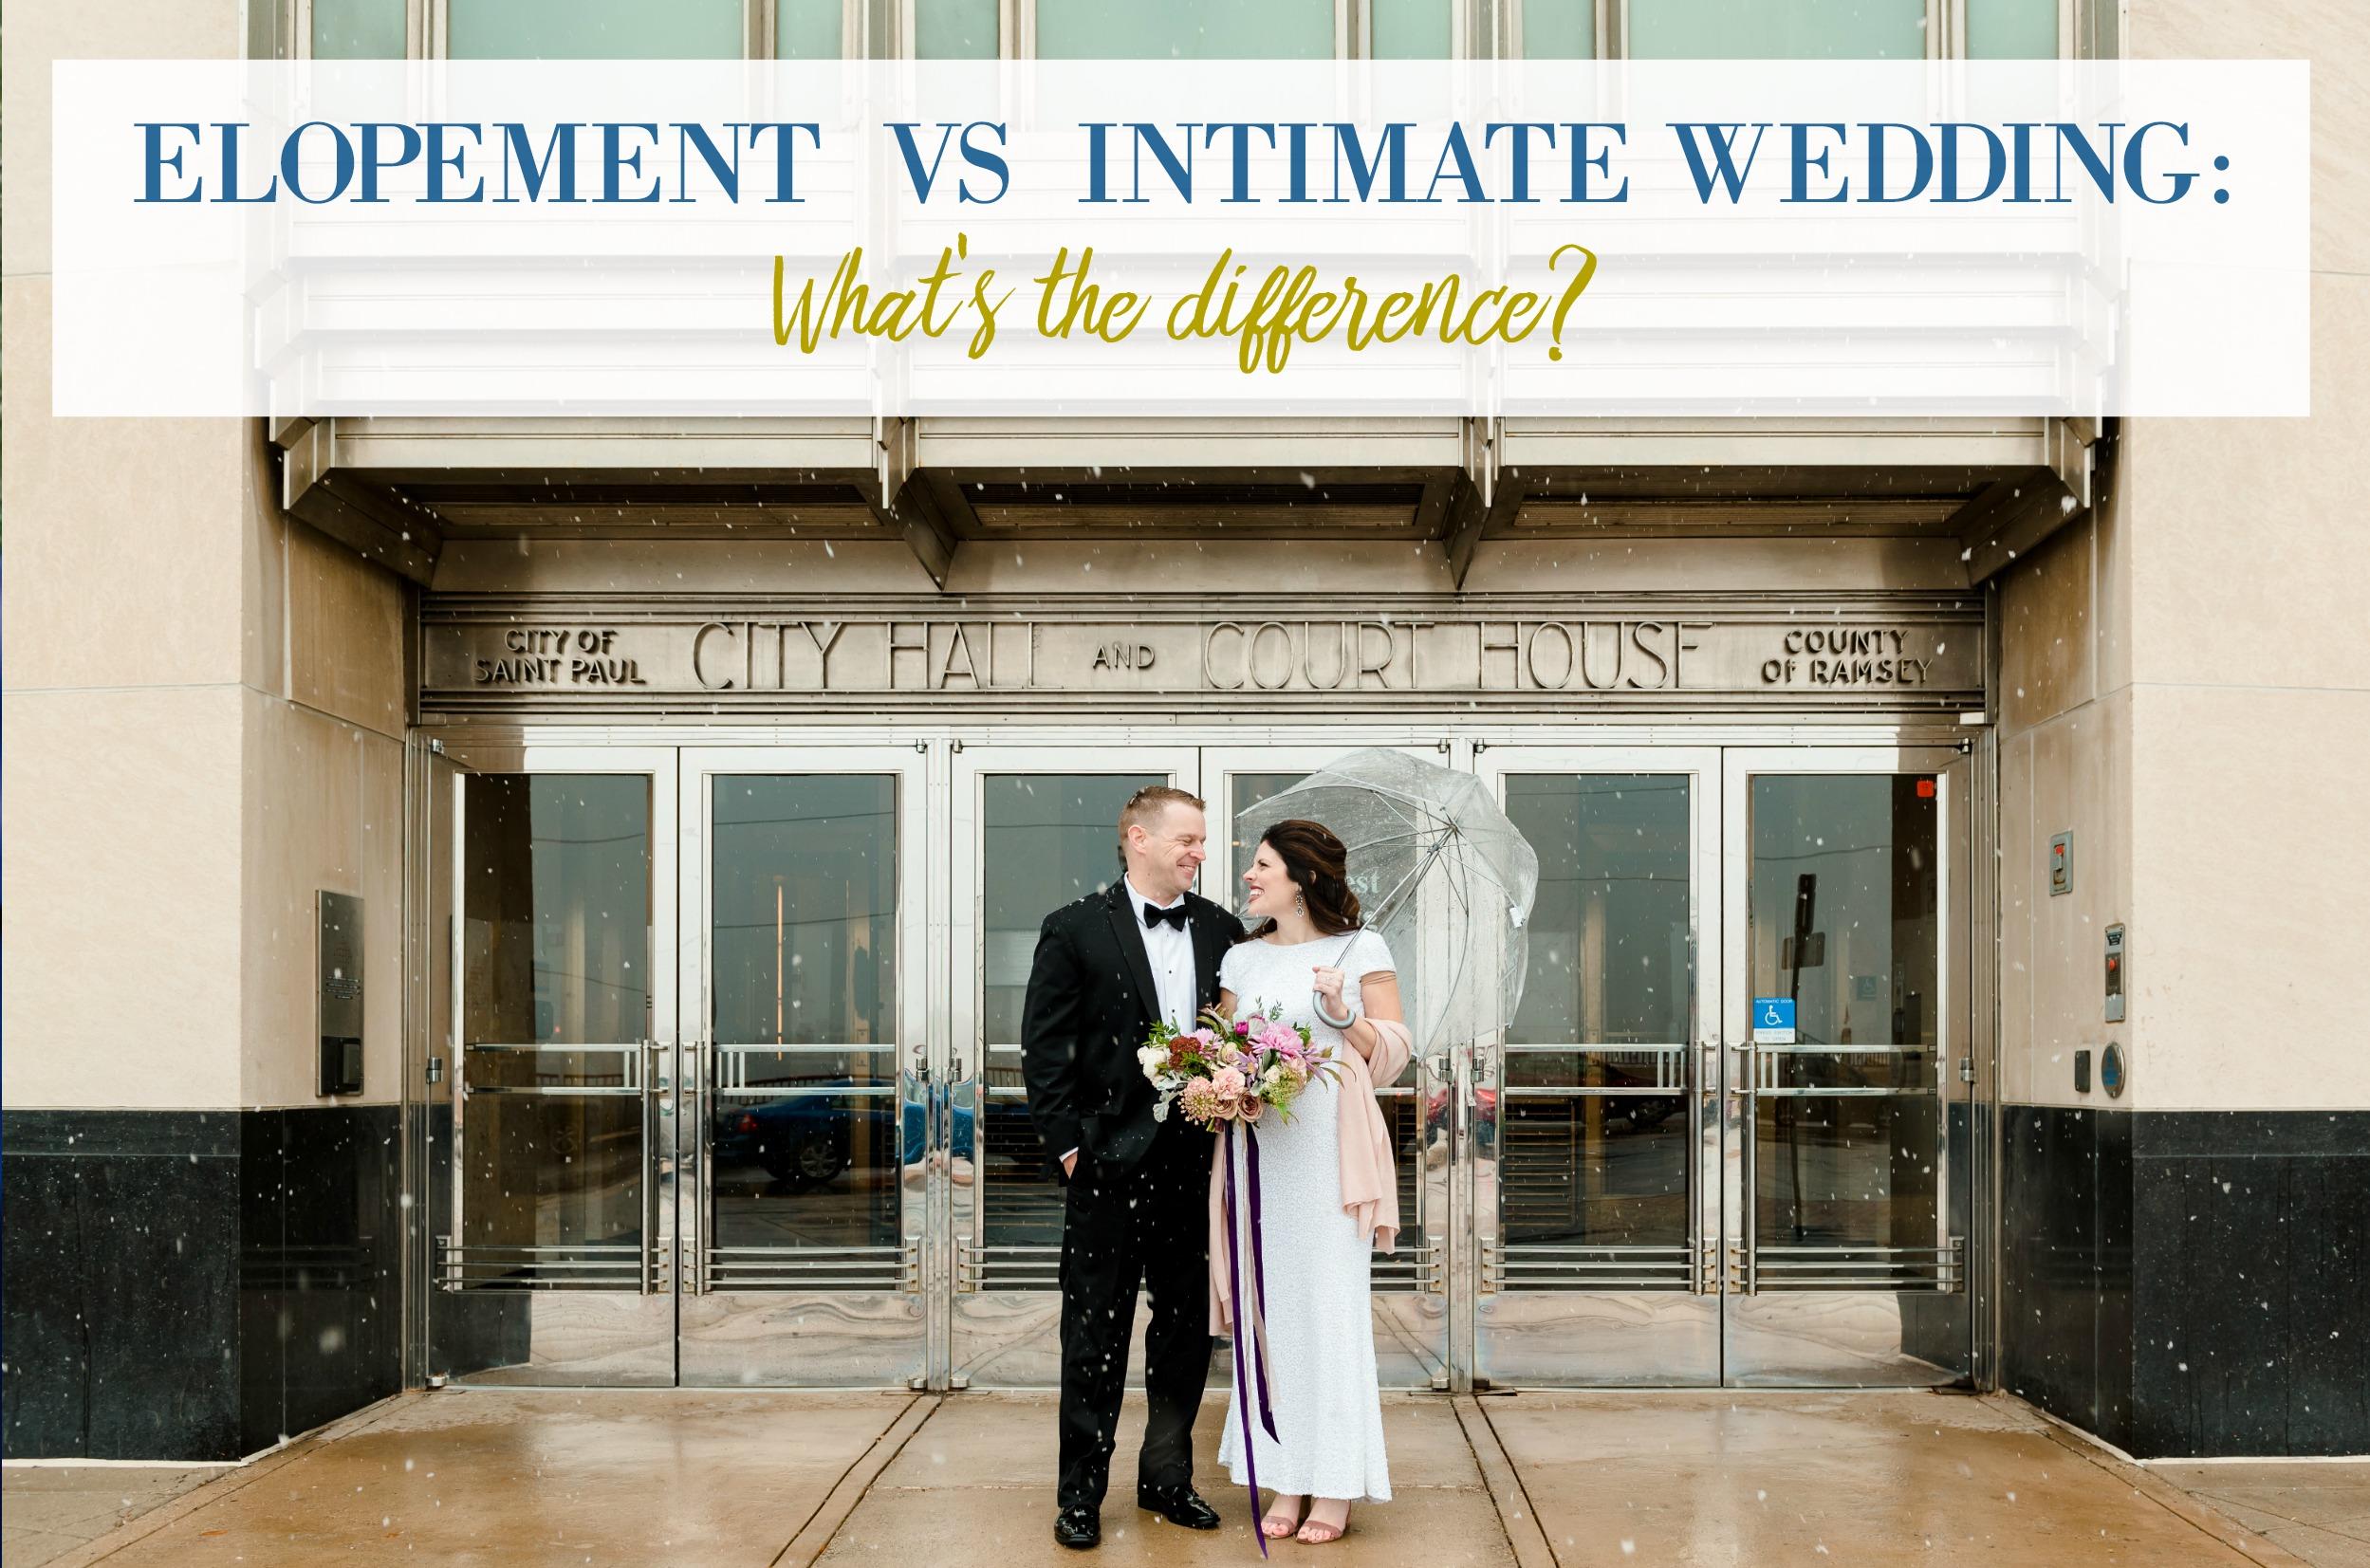 elopement vs intimate wedding.jpg